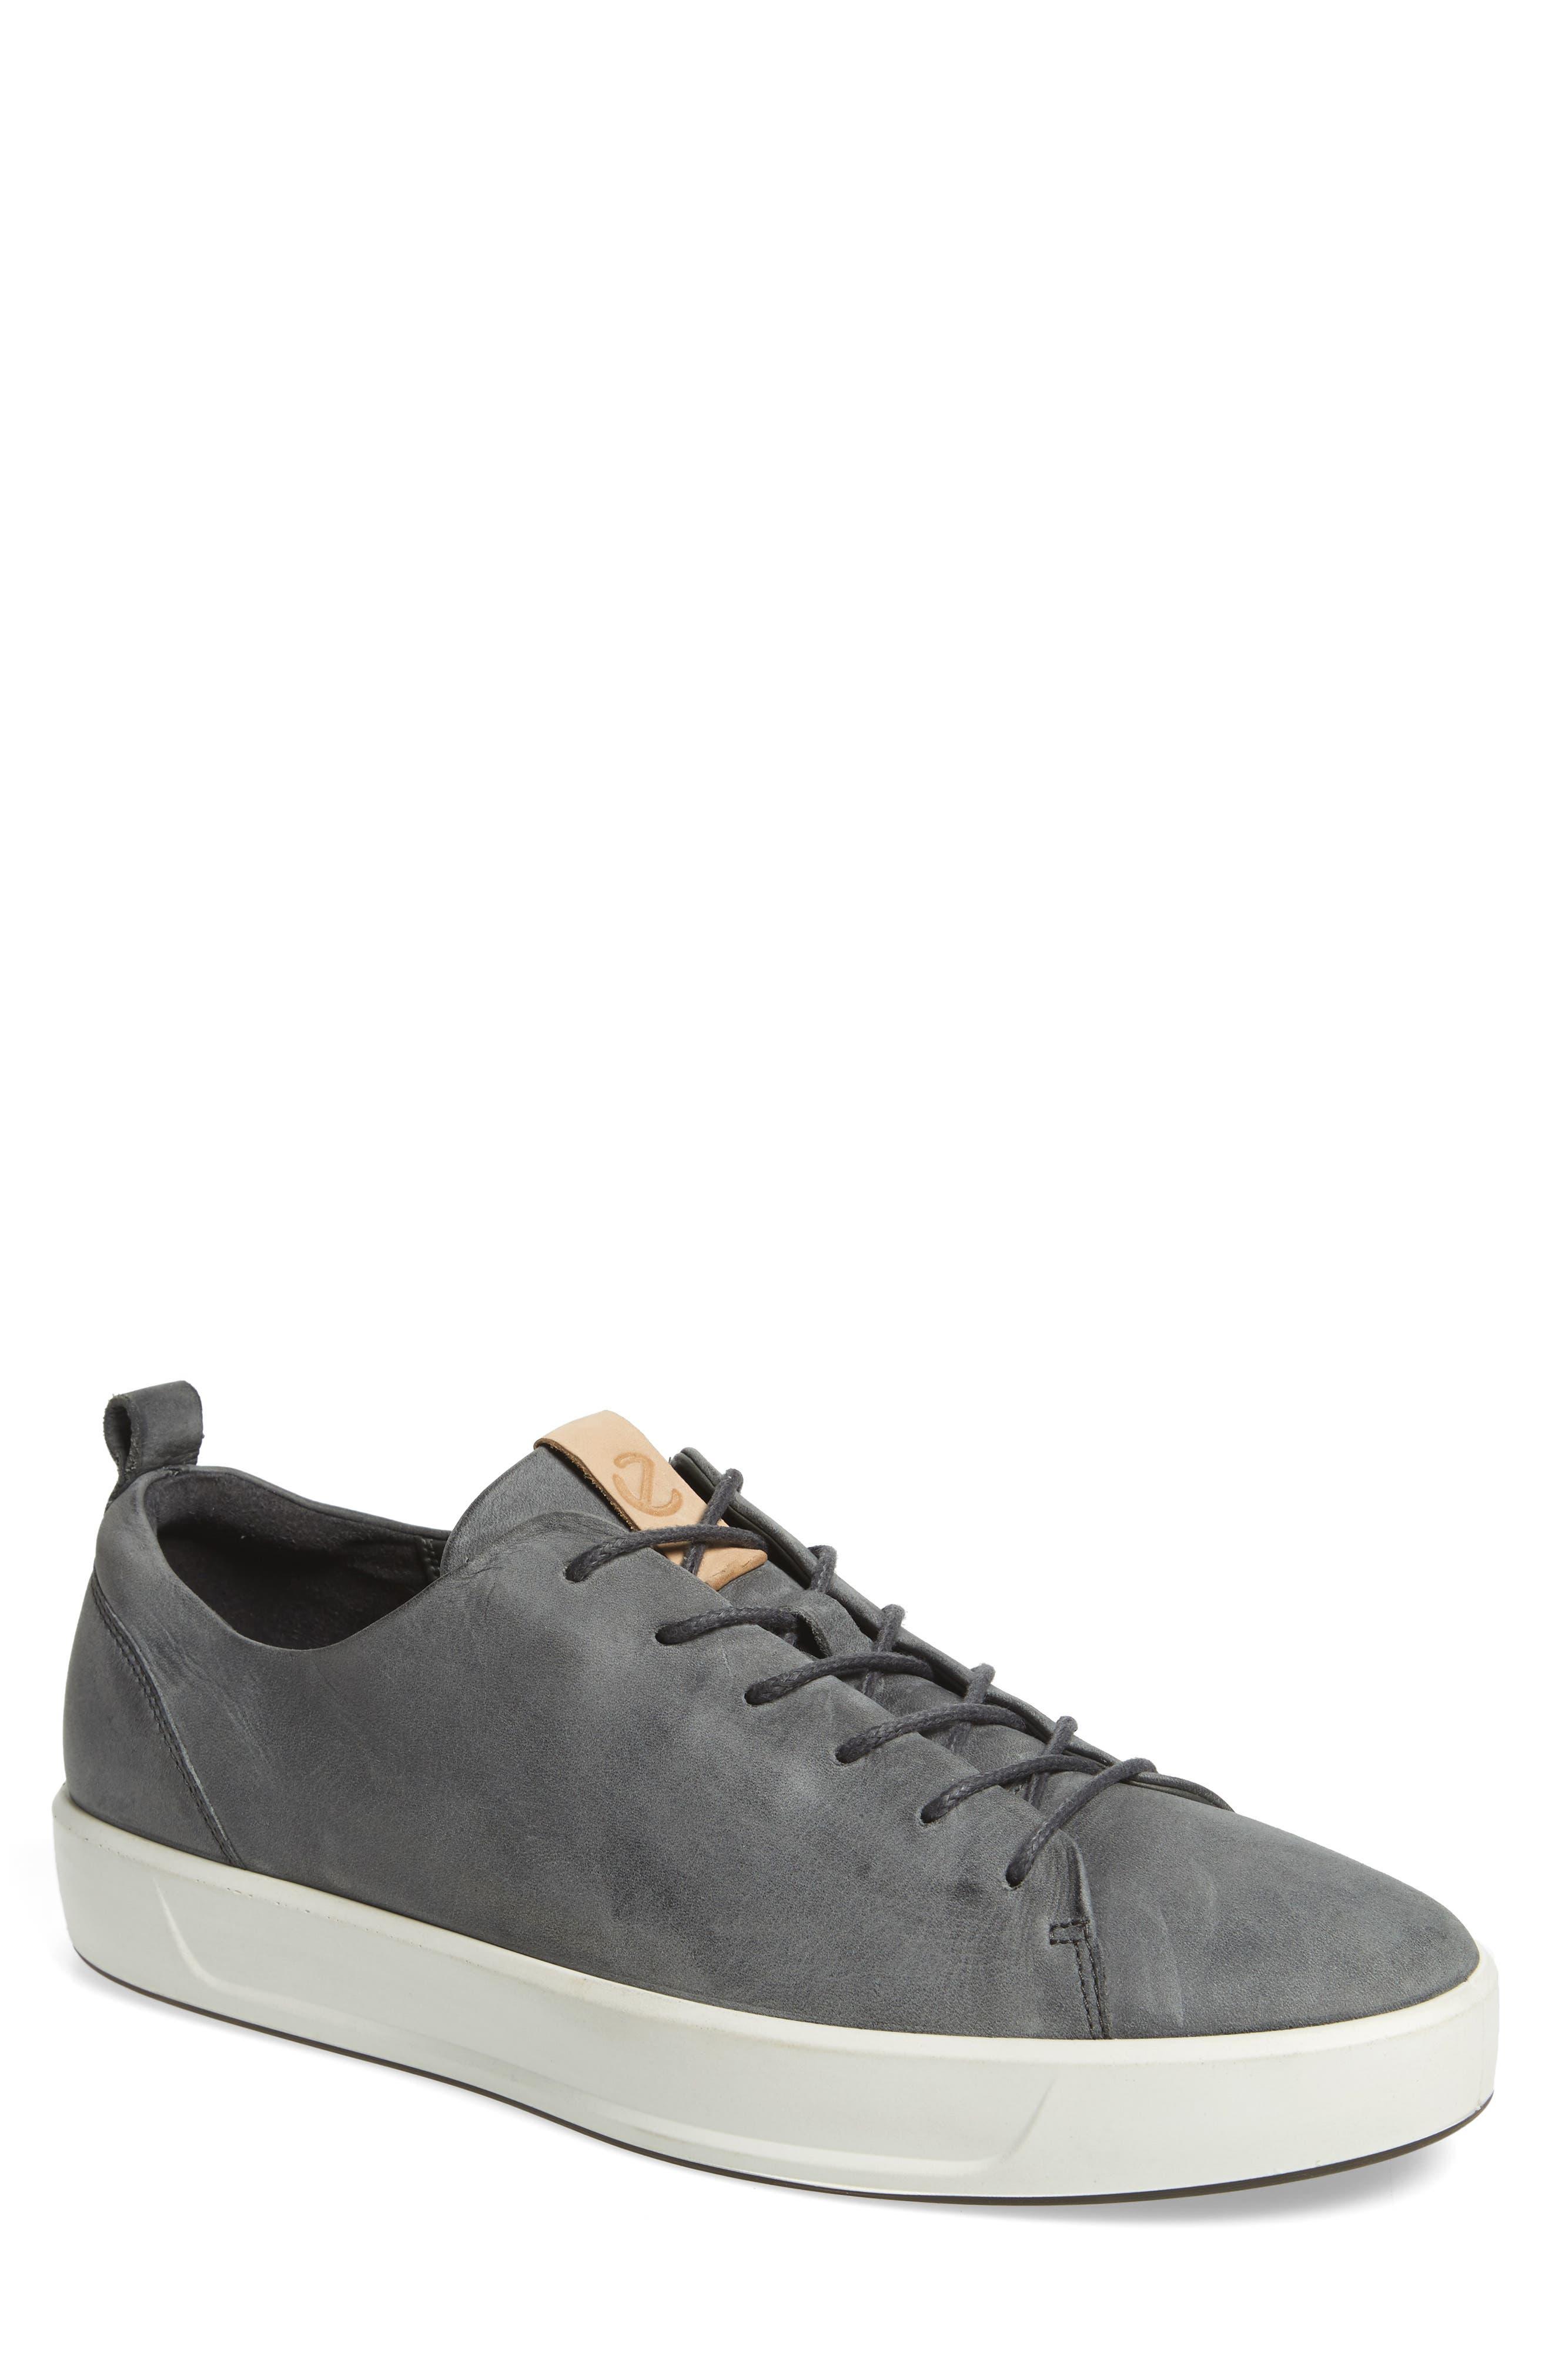 Soft 8 Sneaker,                         Main,                         color, 025